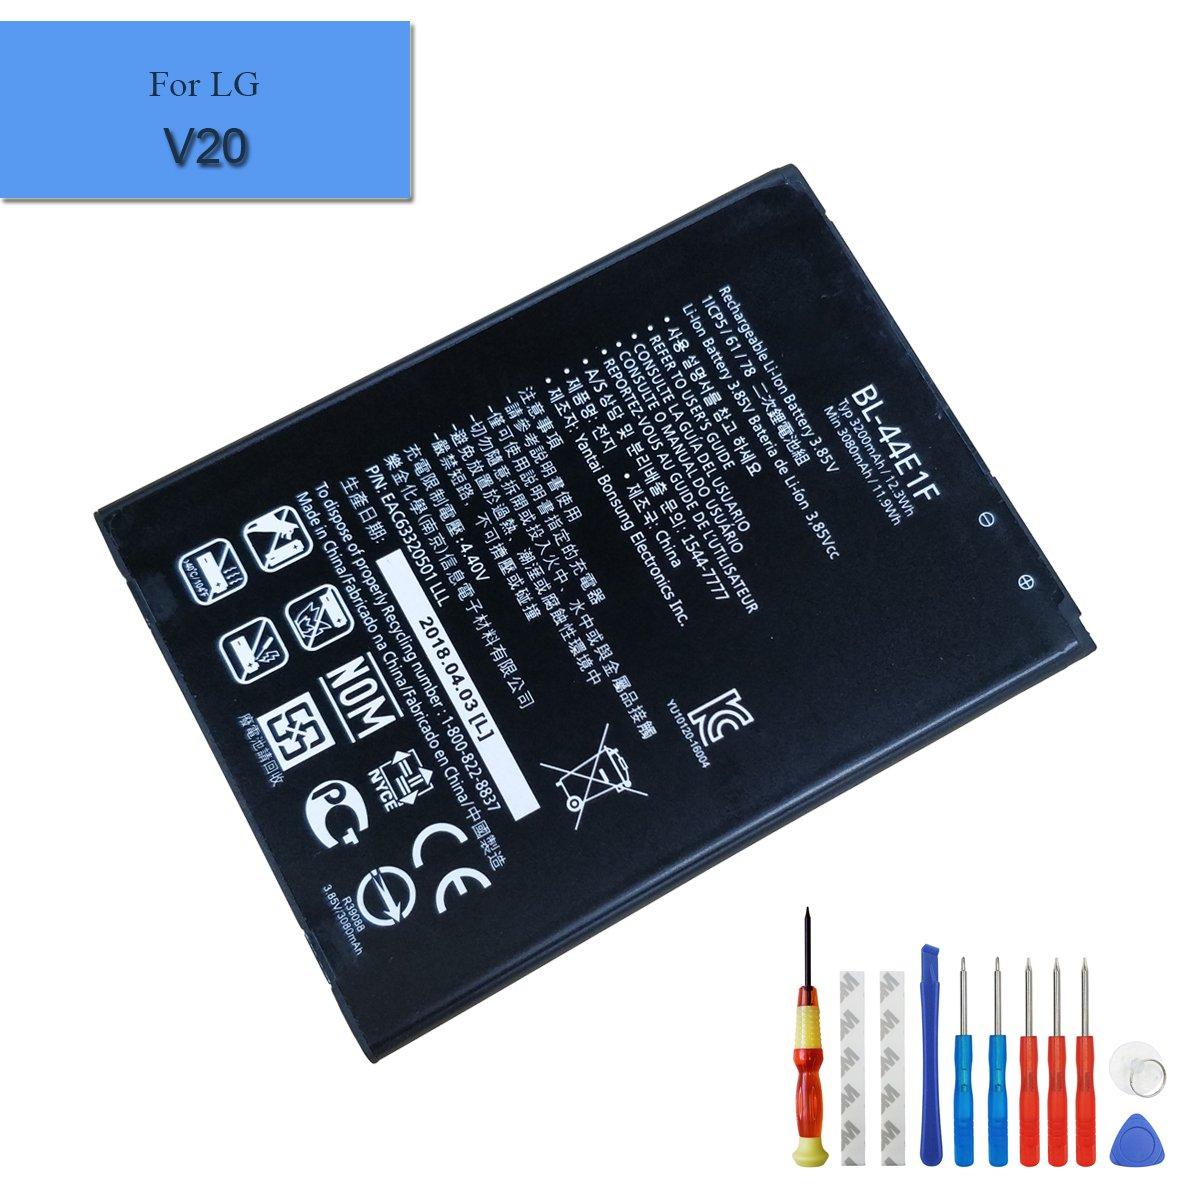 for LG V20 H910 H918 LS997 US996 VS995 New Replacement Battery BL-44E1F 3200mAh 3.85V + Tools E-yiiviil